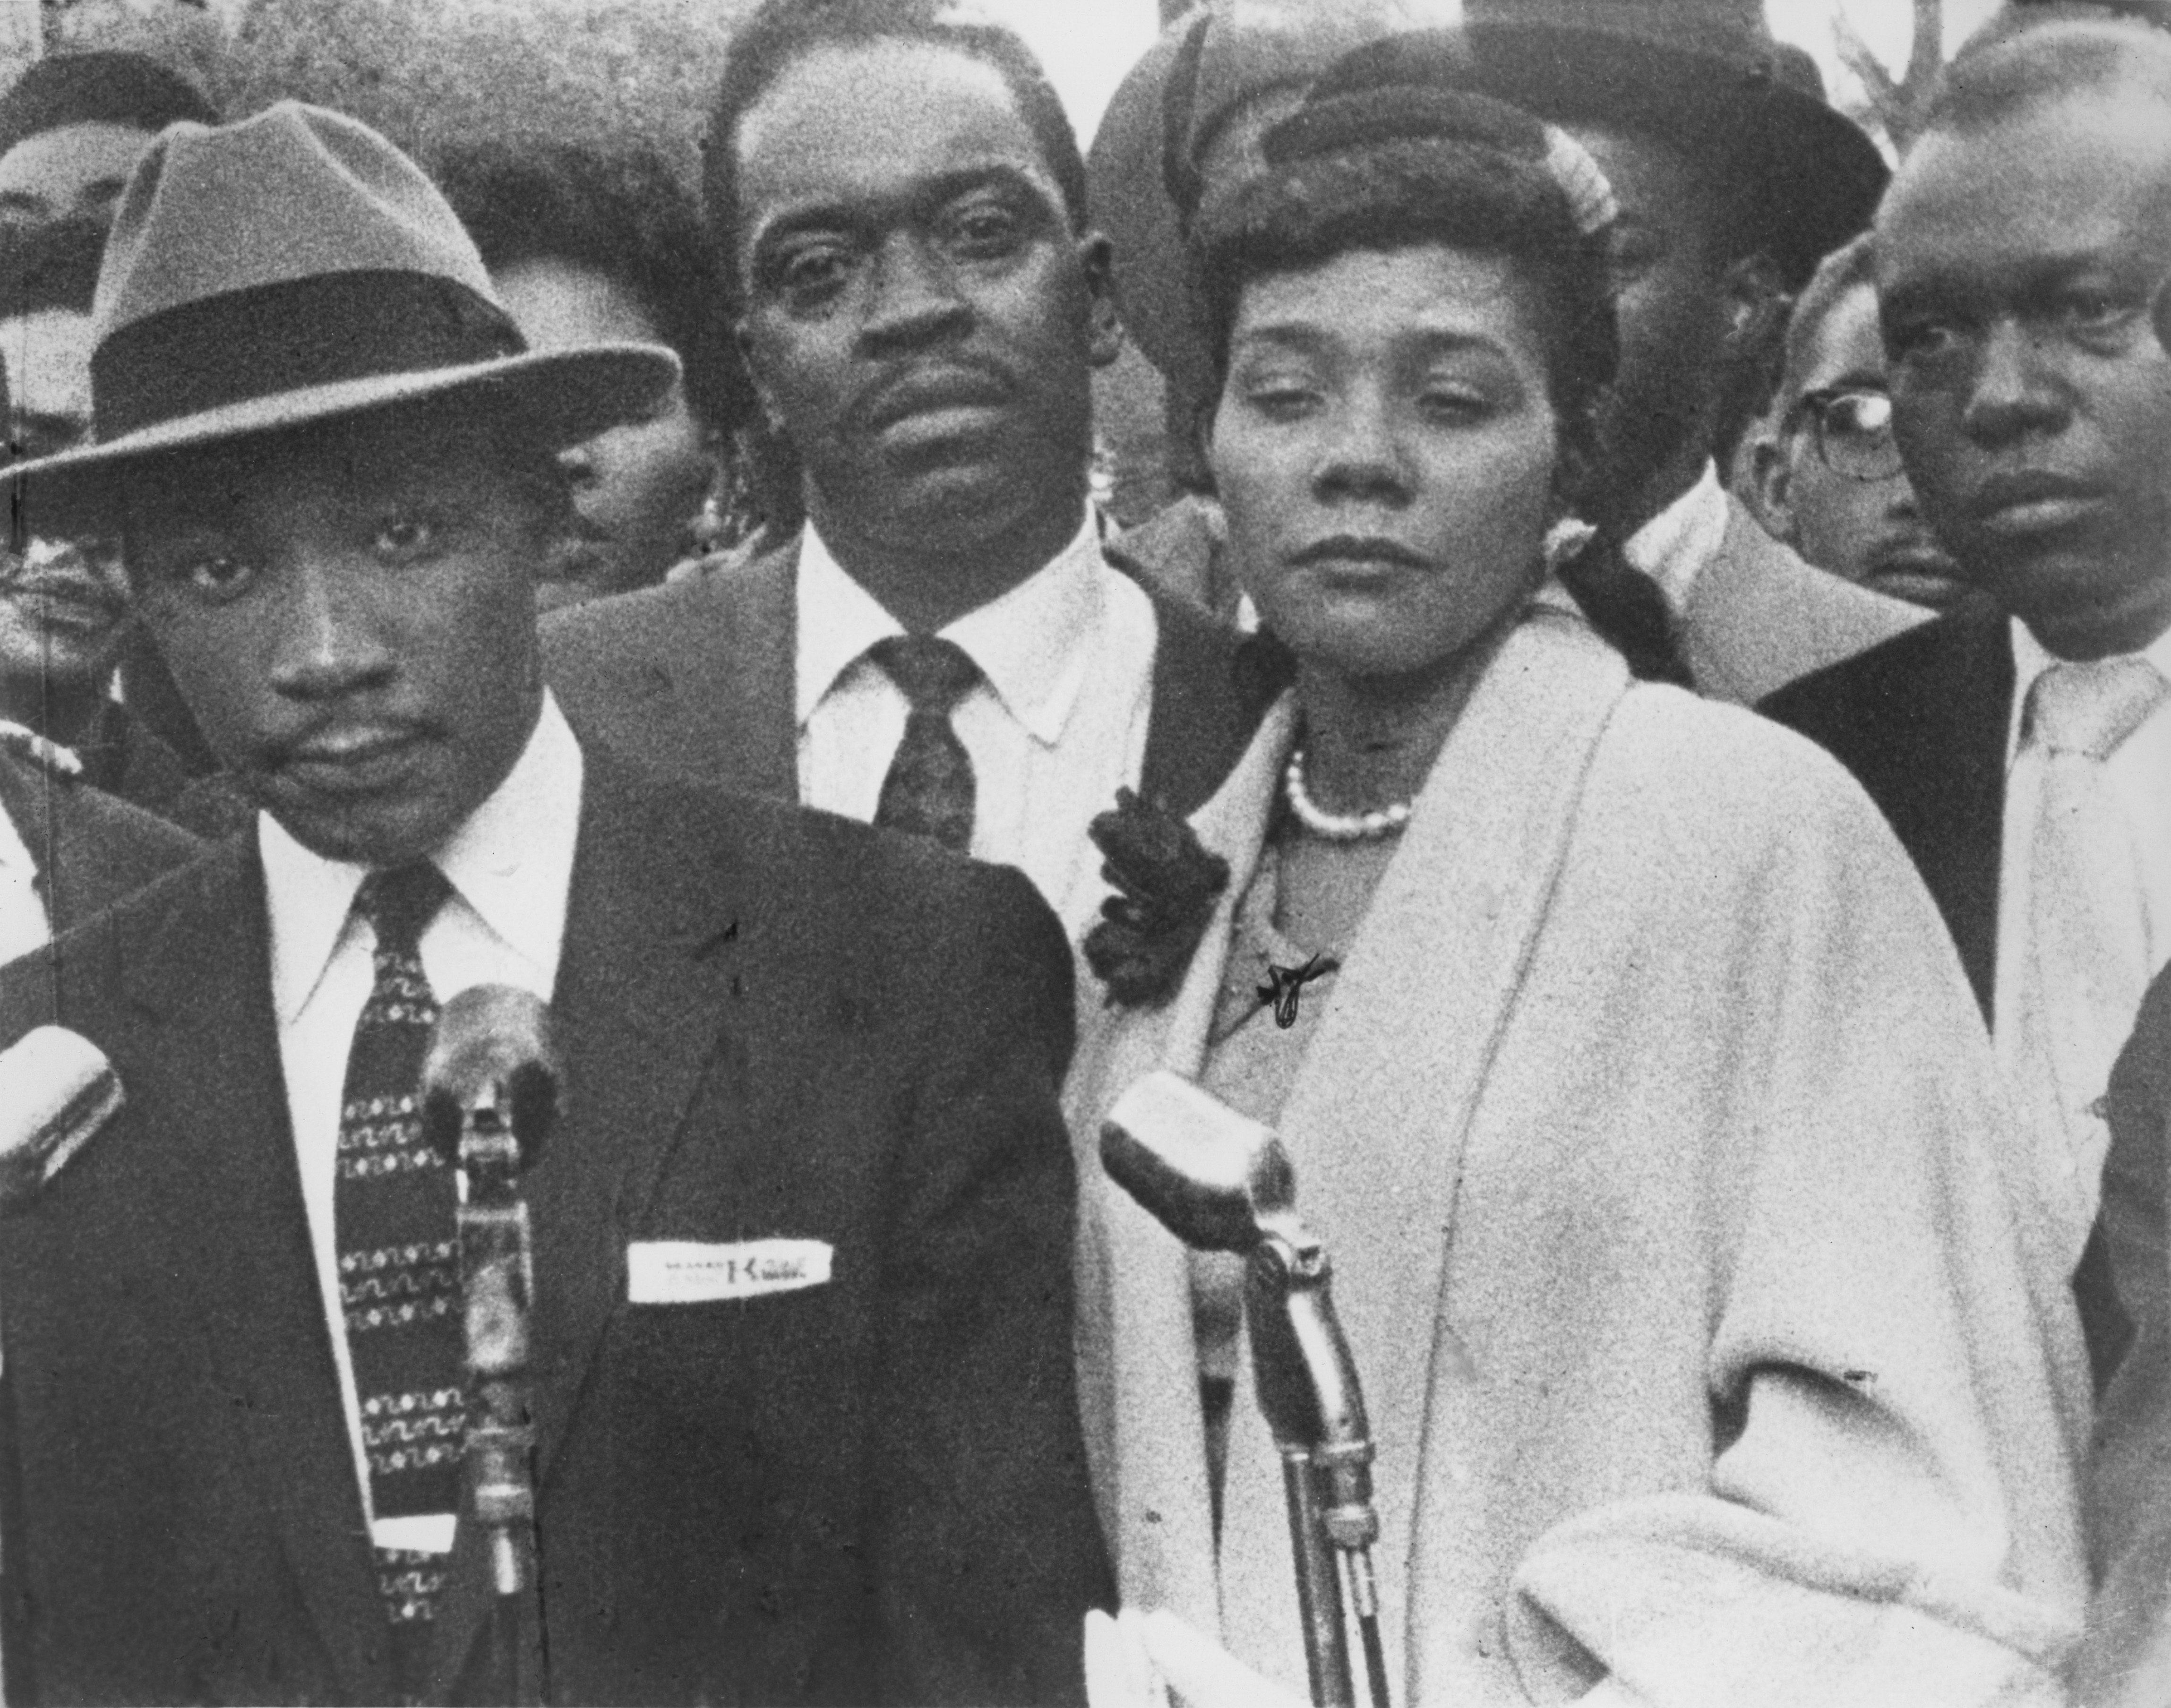 Rarely Seen Photos Of Martin Luther King Jr